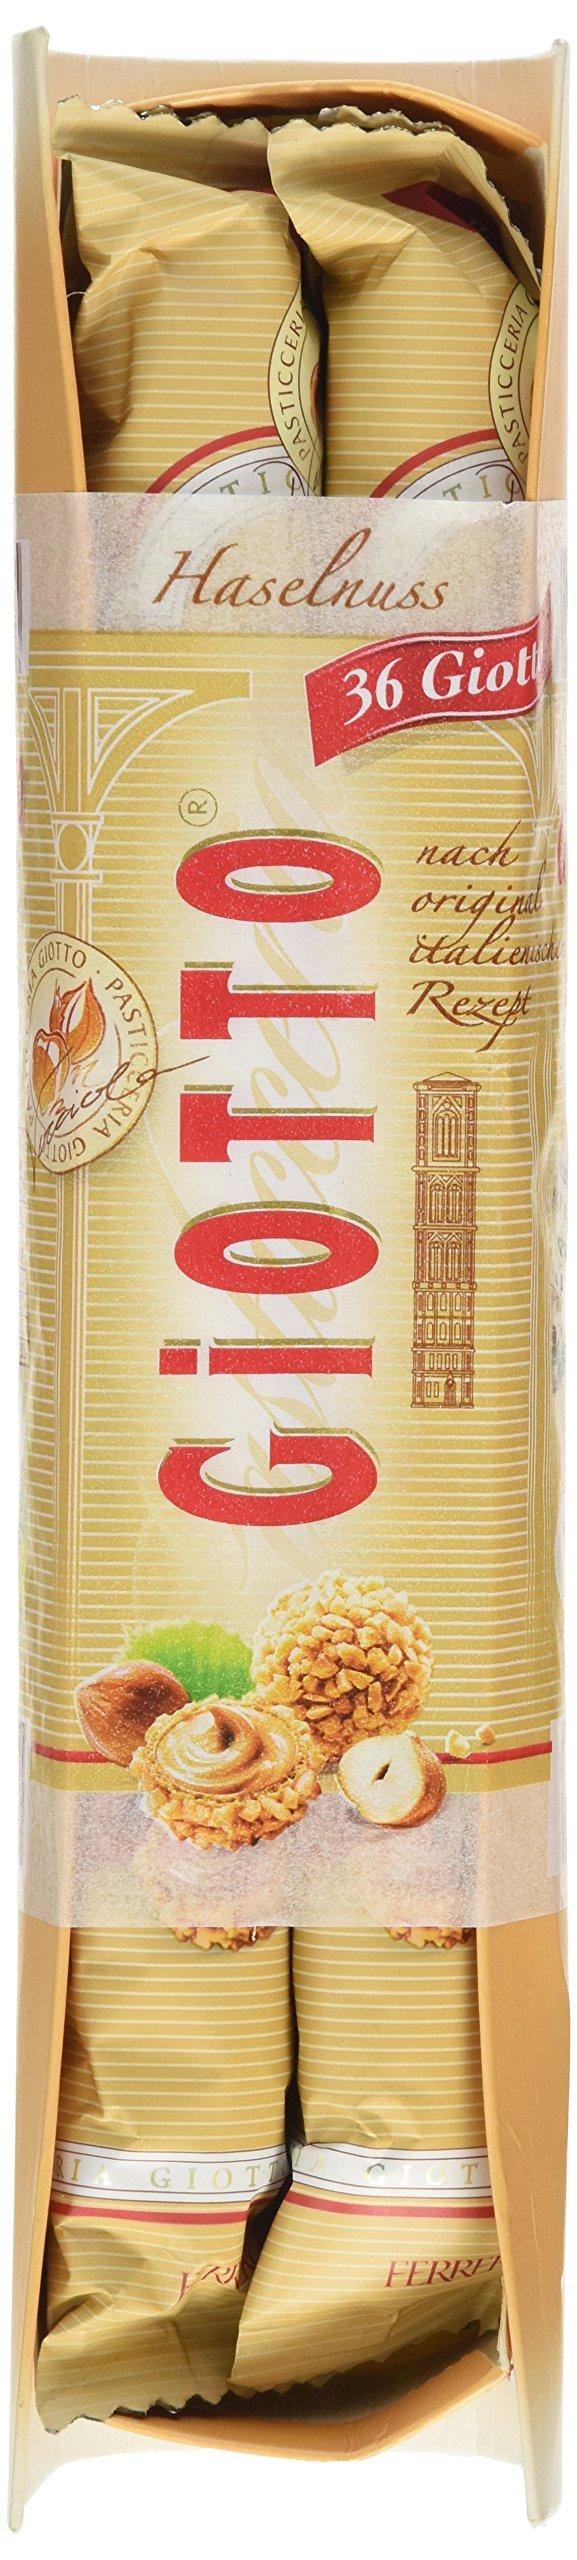 Amazon.com : Ferrero Giotto Hazelnut Cream Balls in Bag ...  Amazon.com : Fe...